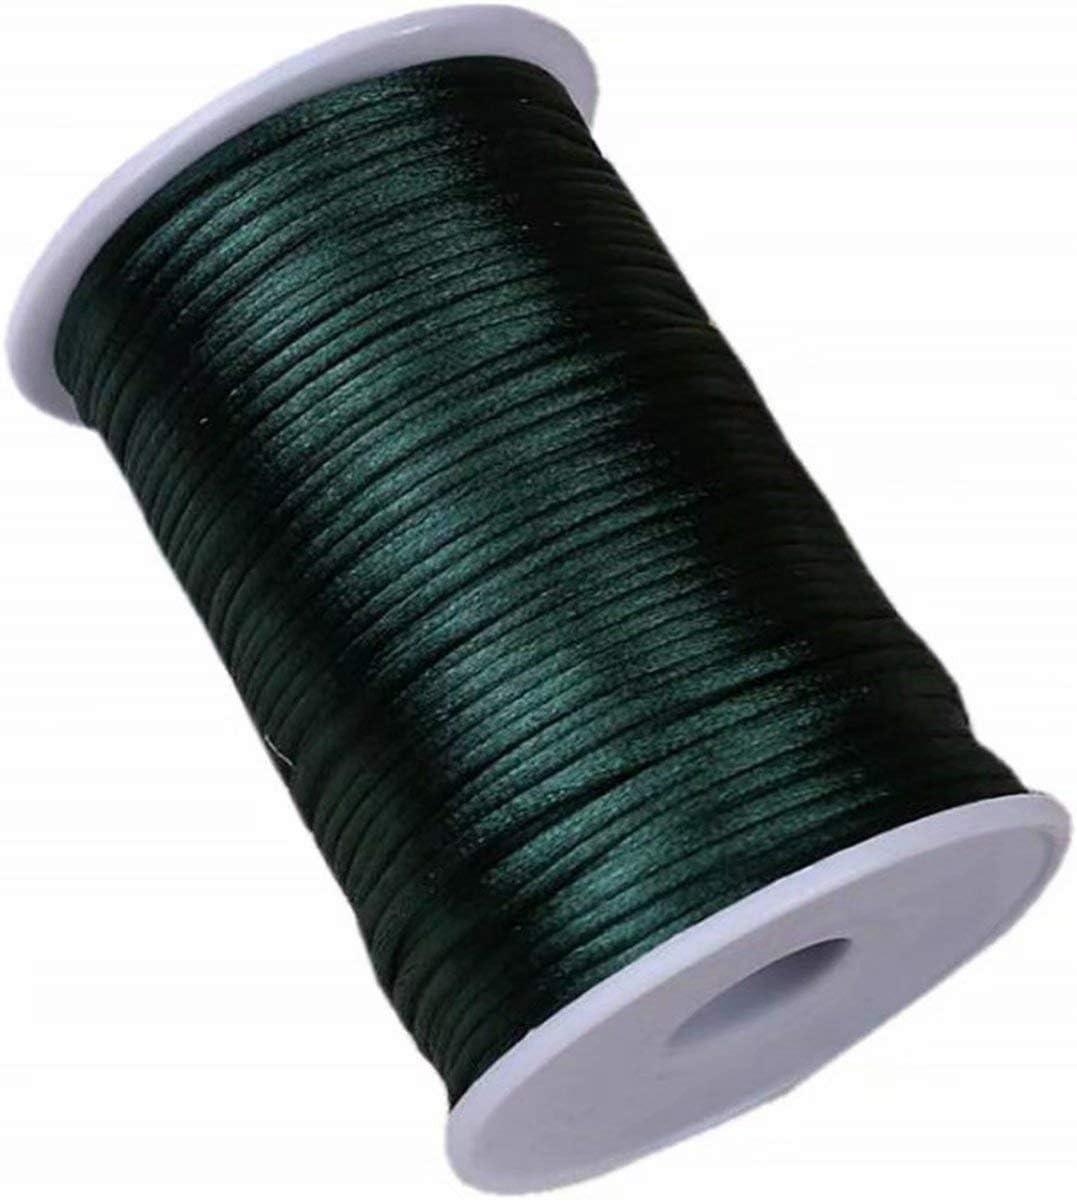 Nylon Satin Trim Cord for Necklace Shoelaces DIY Making Vivianbuy Brick 2.5mm Dia Satin Cord 109 Yard Rattail Silk Cord